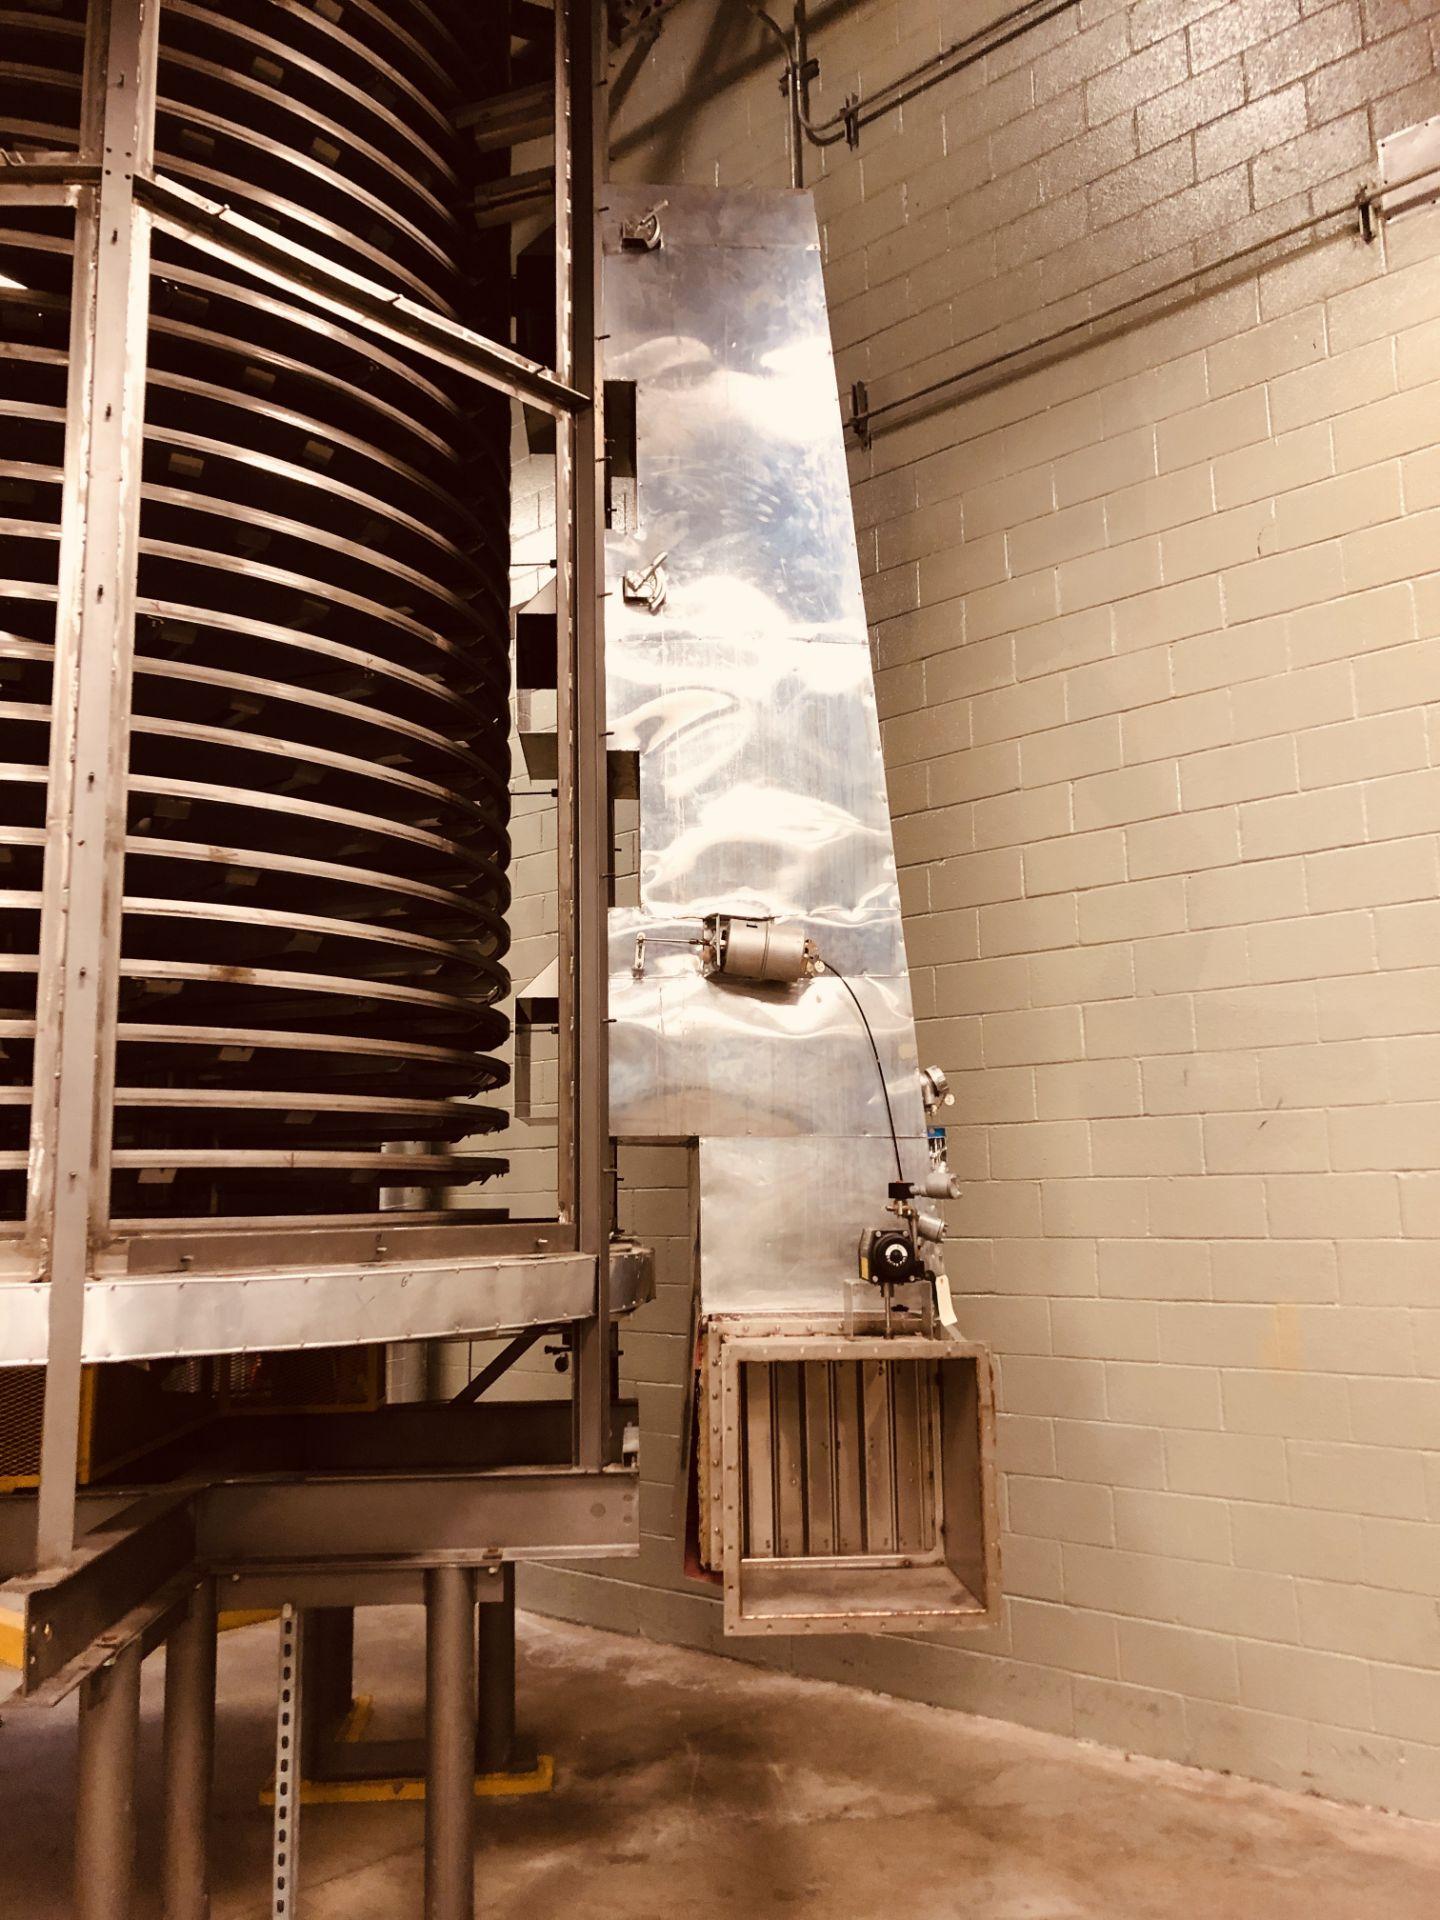 Wyssmont Model OE-32 Turbo Dryer - Includes Blower & Rotary Air Locks - Image 4 of 6